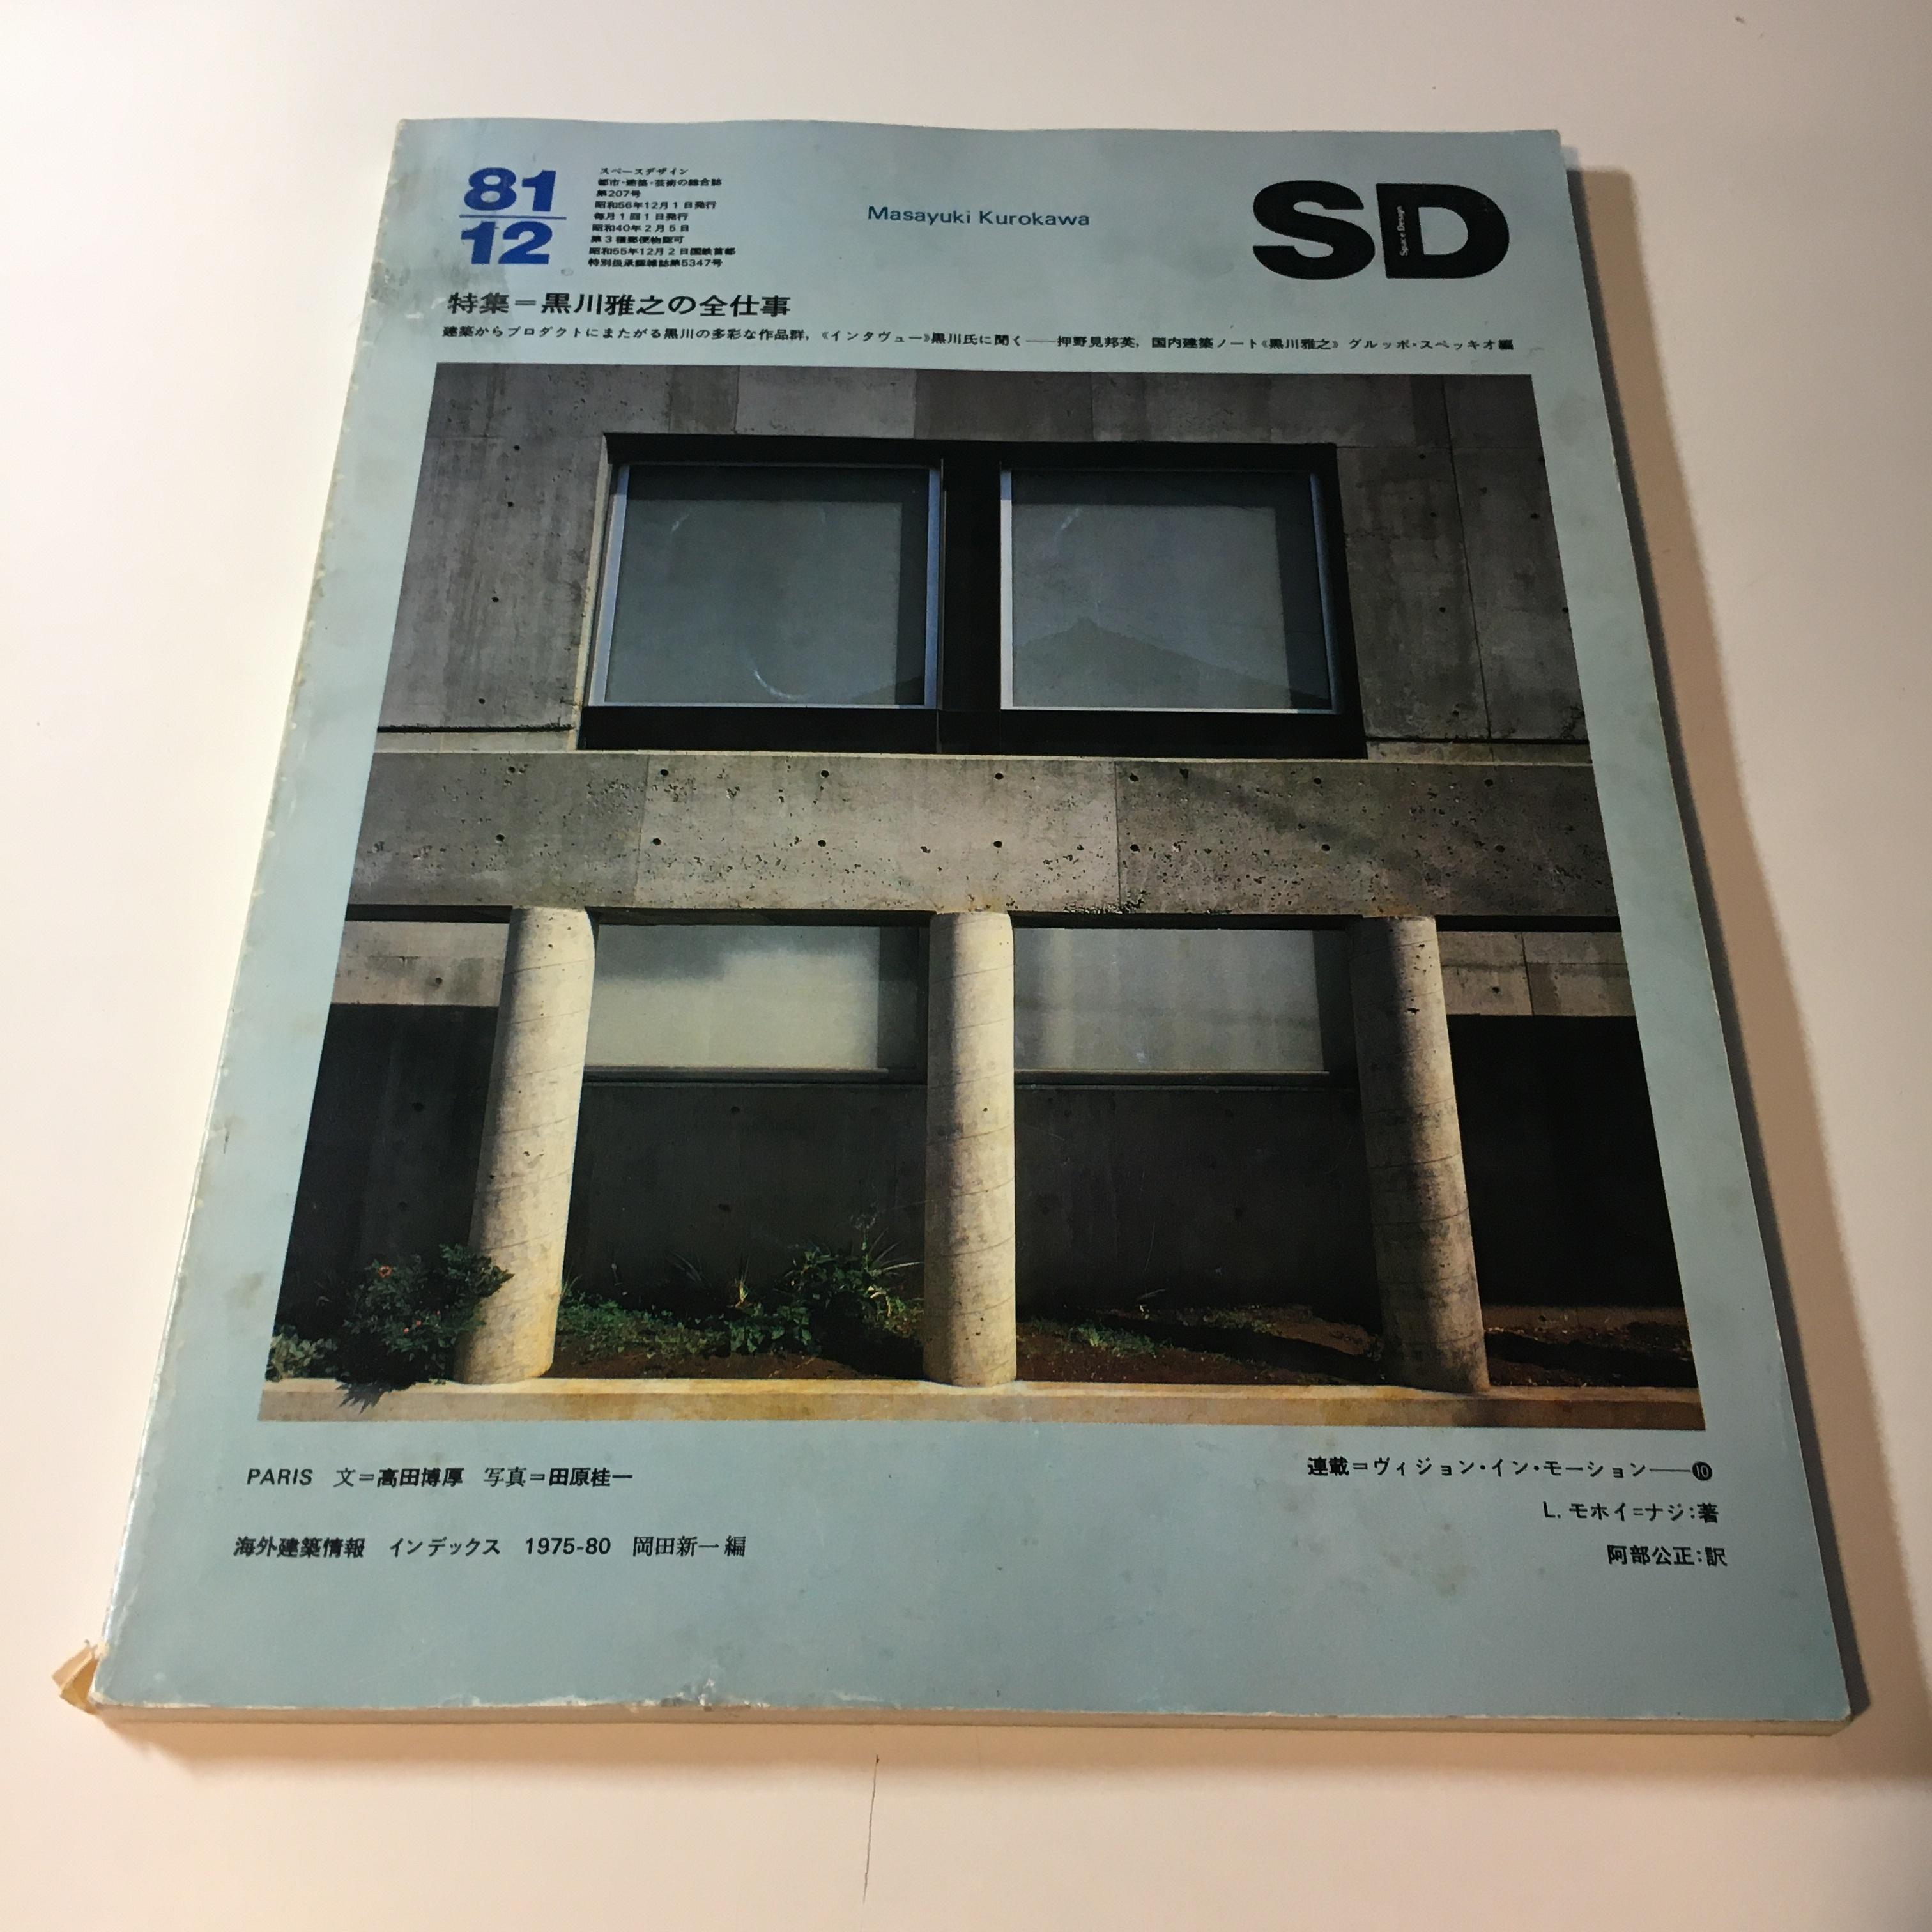 SD8112 黒川雅之の全仕事 / 鹿島出版会